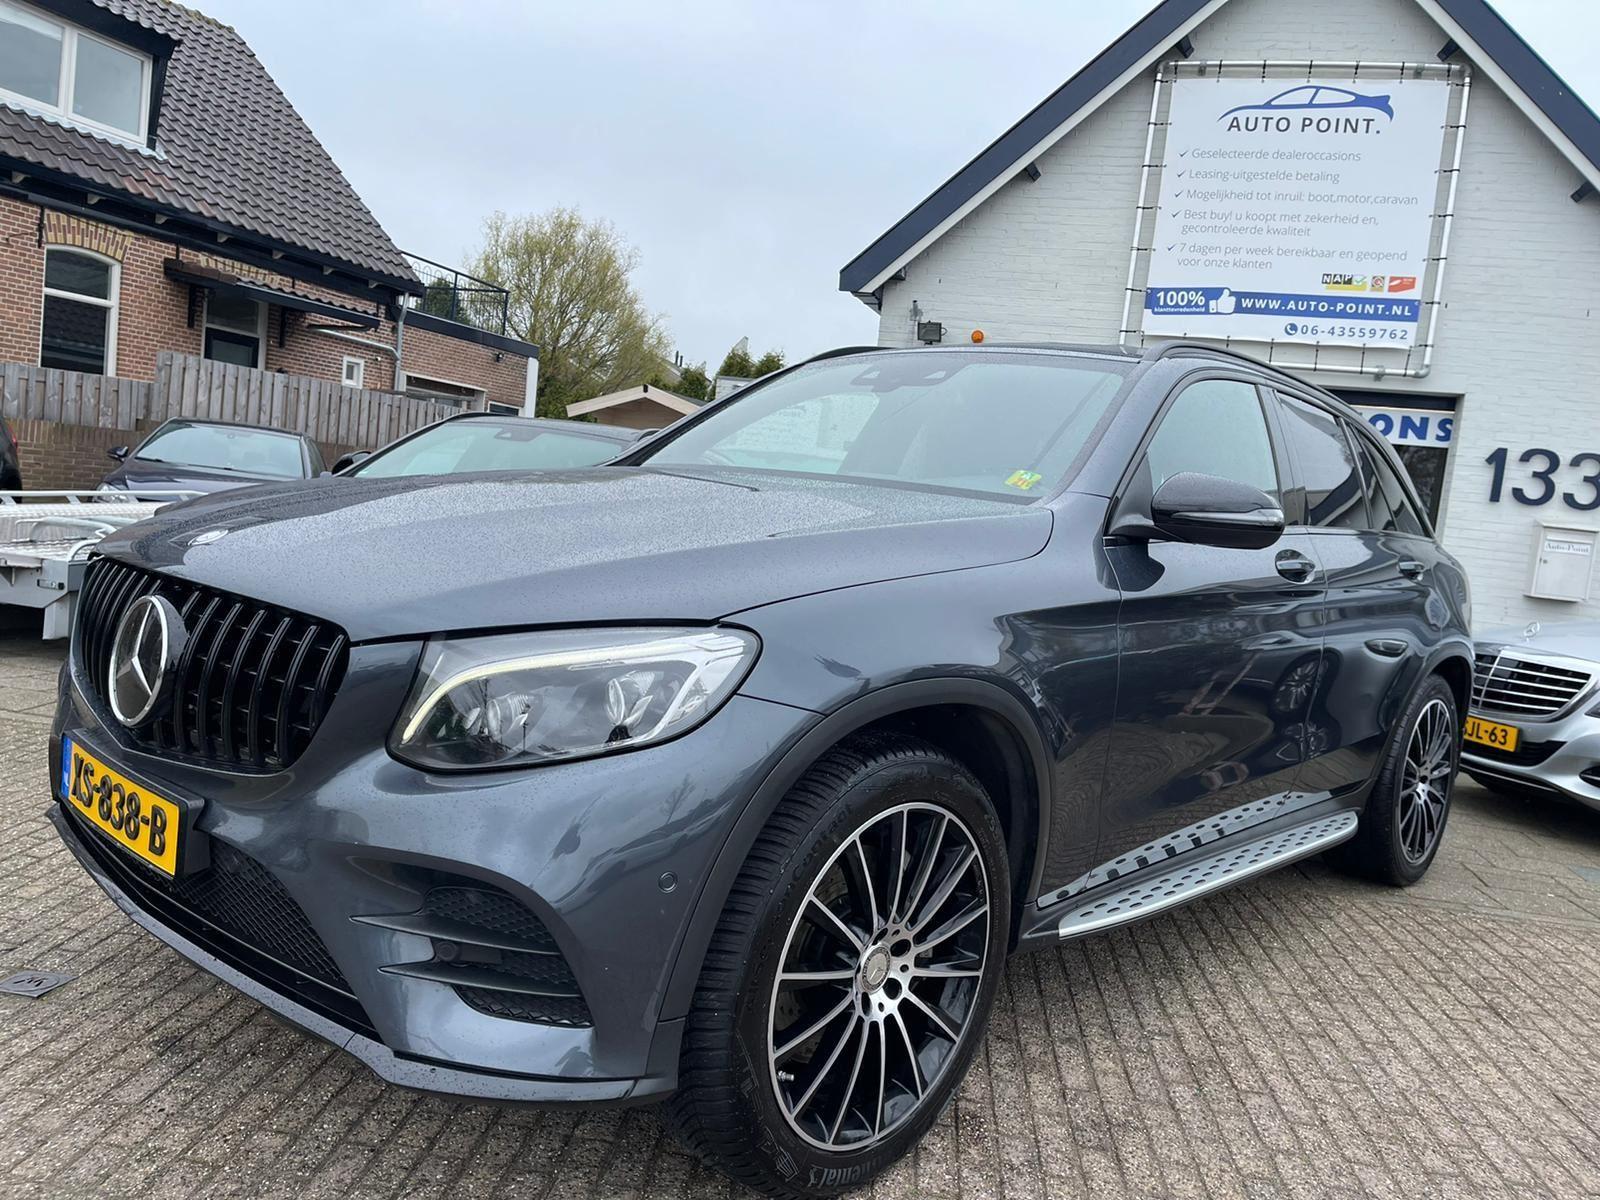 Mercedes-Benz GLC-klasse occasion - Auto Point